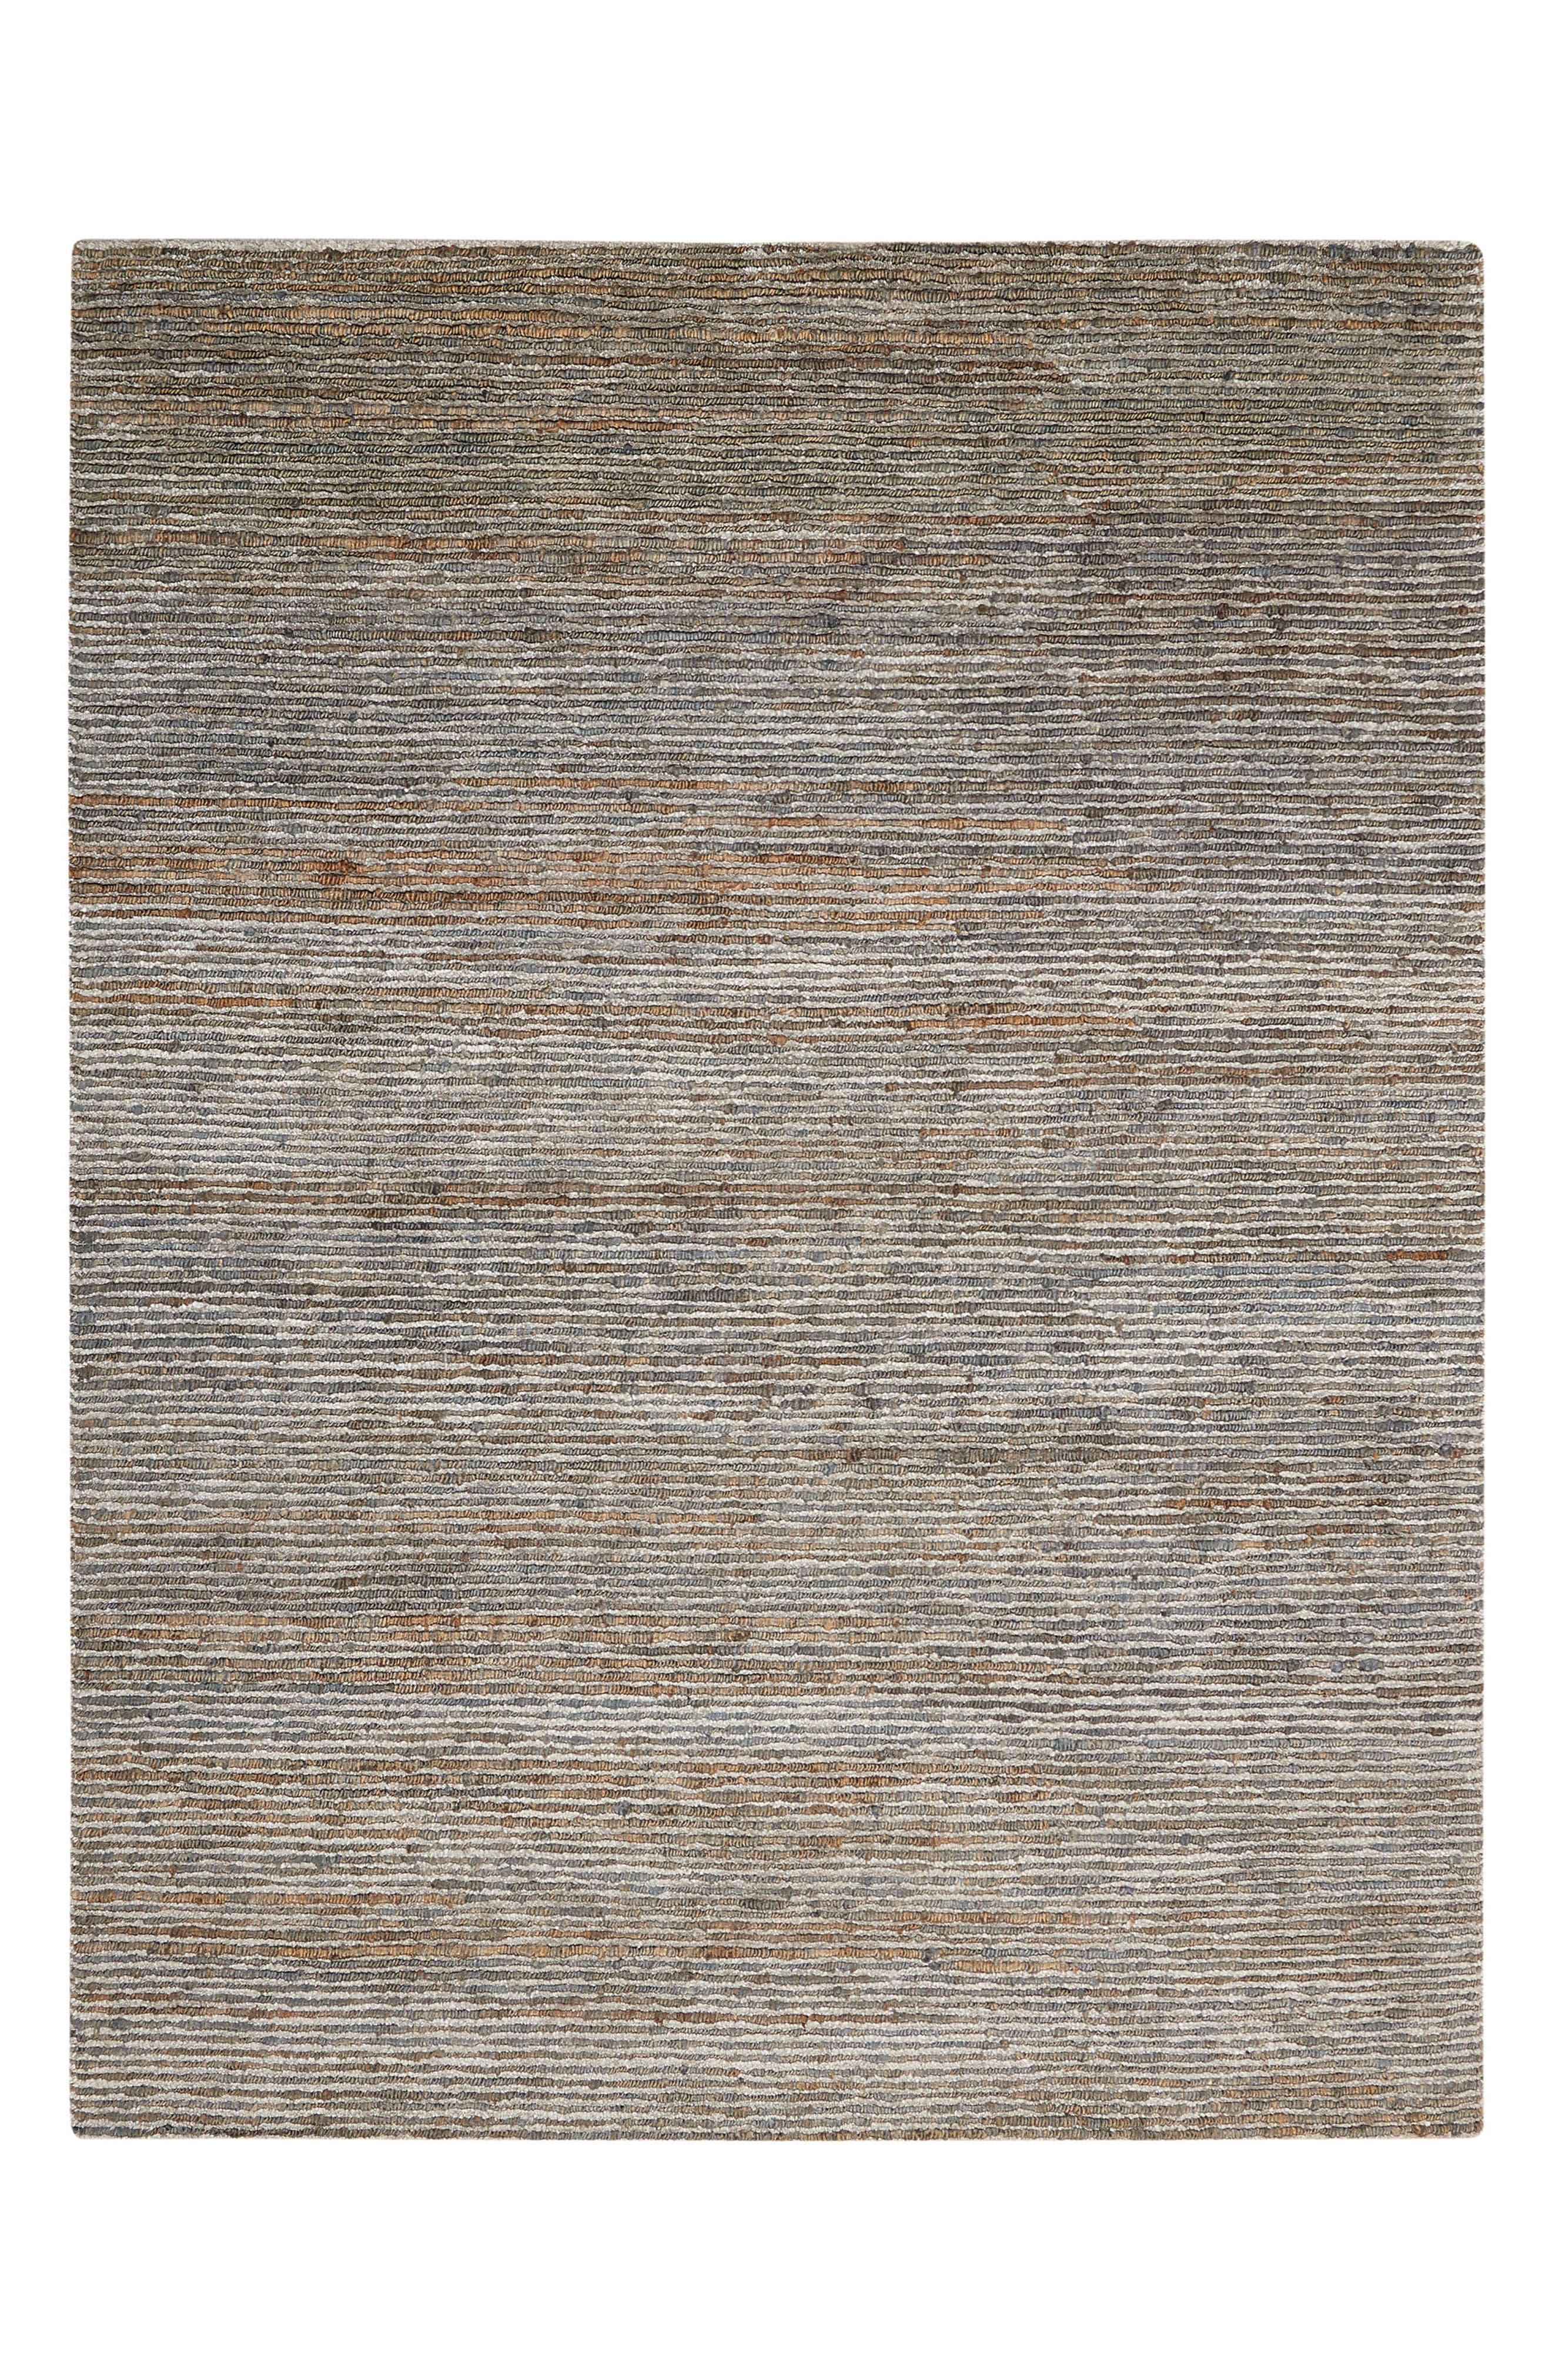 Home Mesa Indus Area Rug,                             Main thumbnail 1, color,                             001